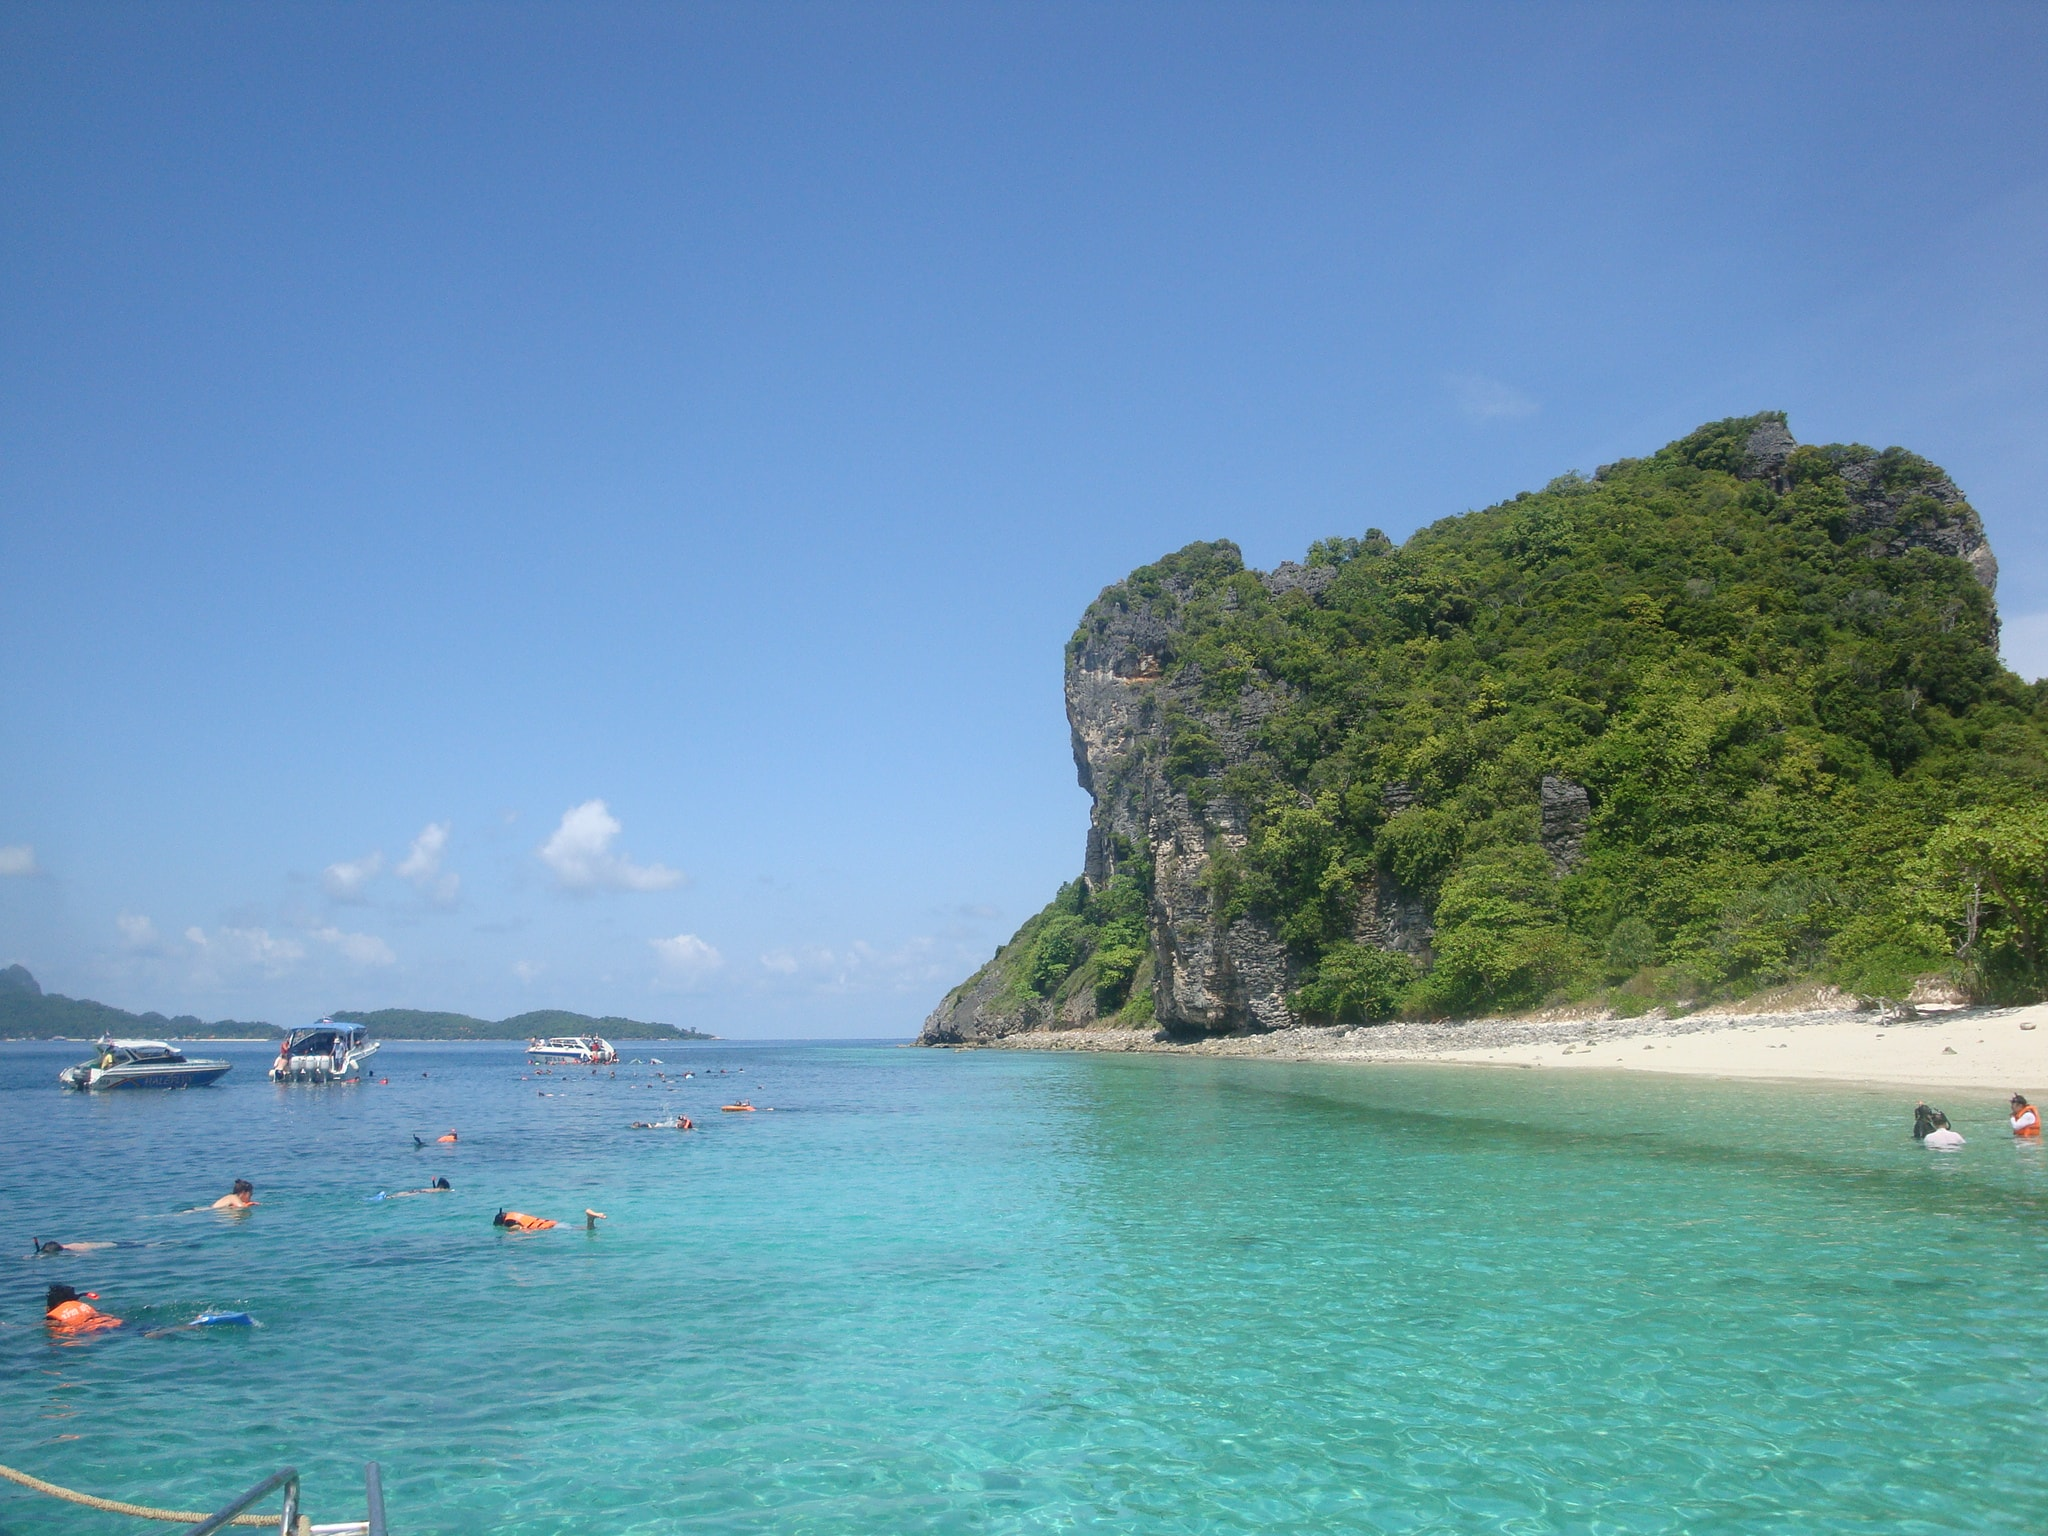 Yung Island (Mosquito Island)